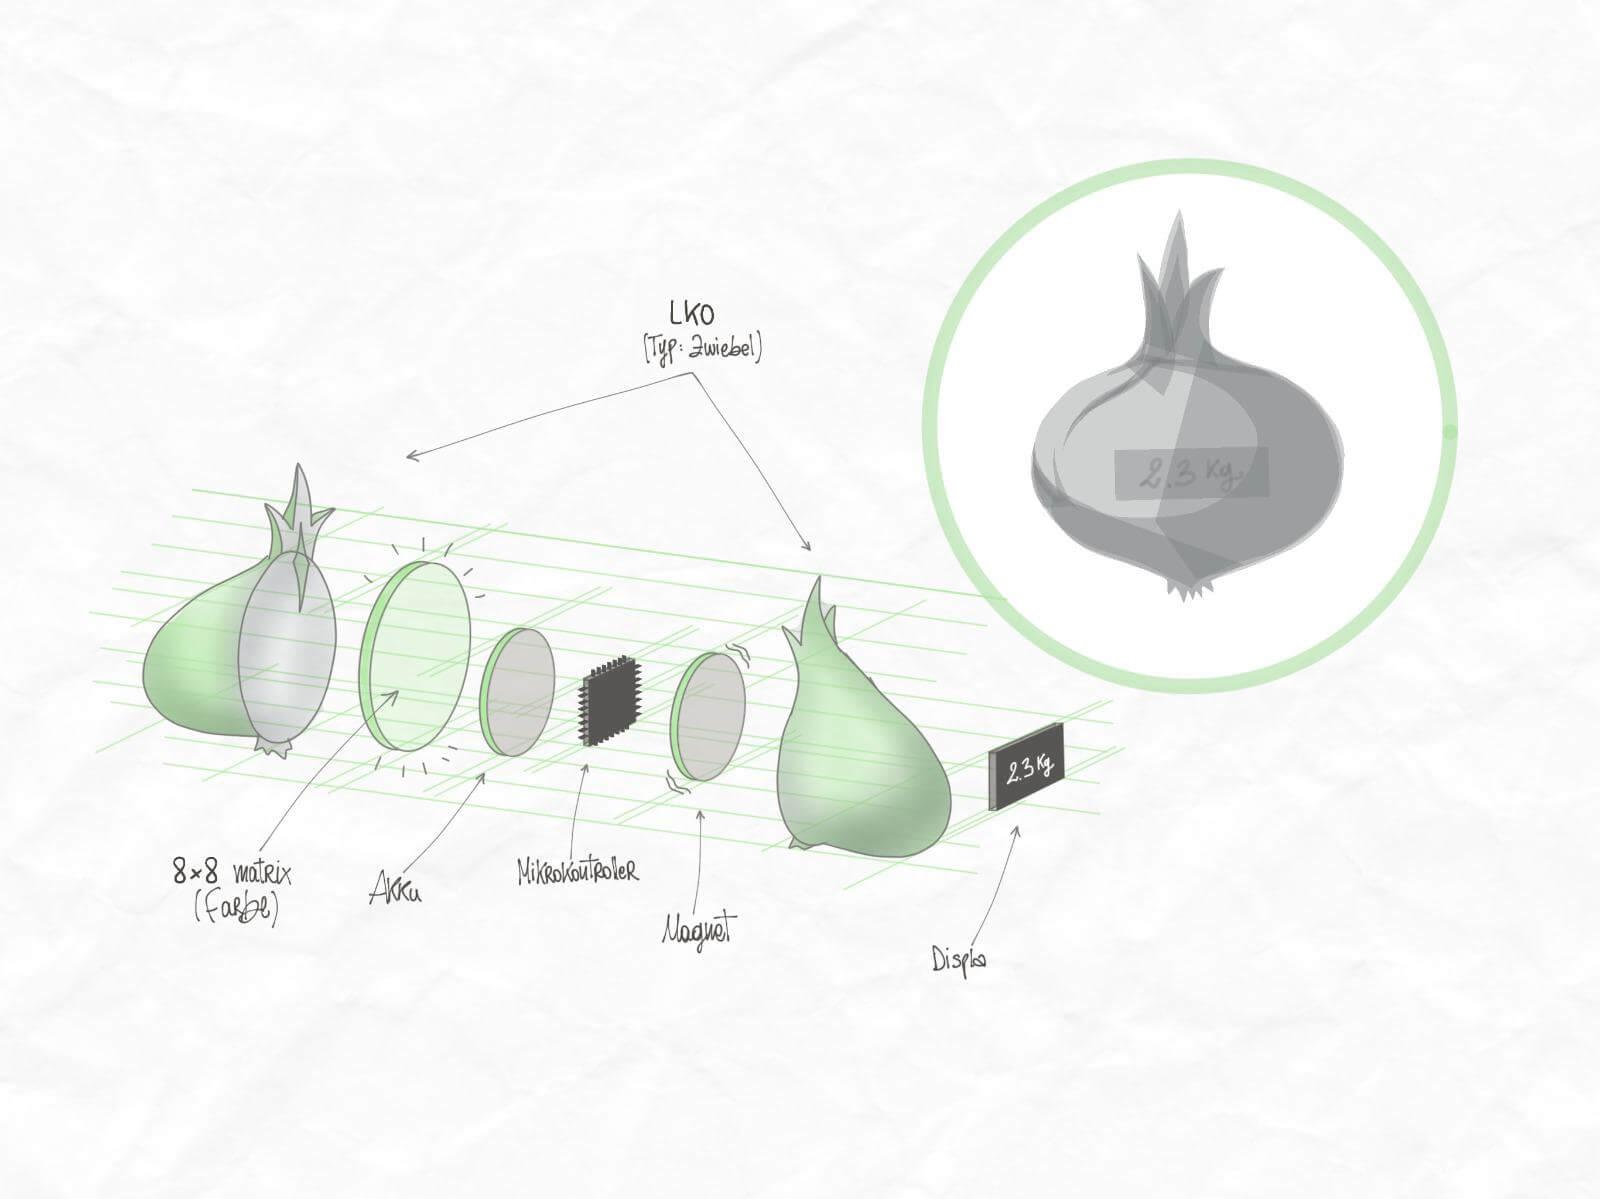 Der Aufbau des Lebensmittelkontrollobjekts